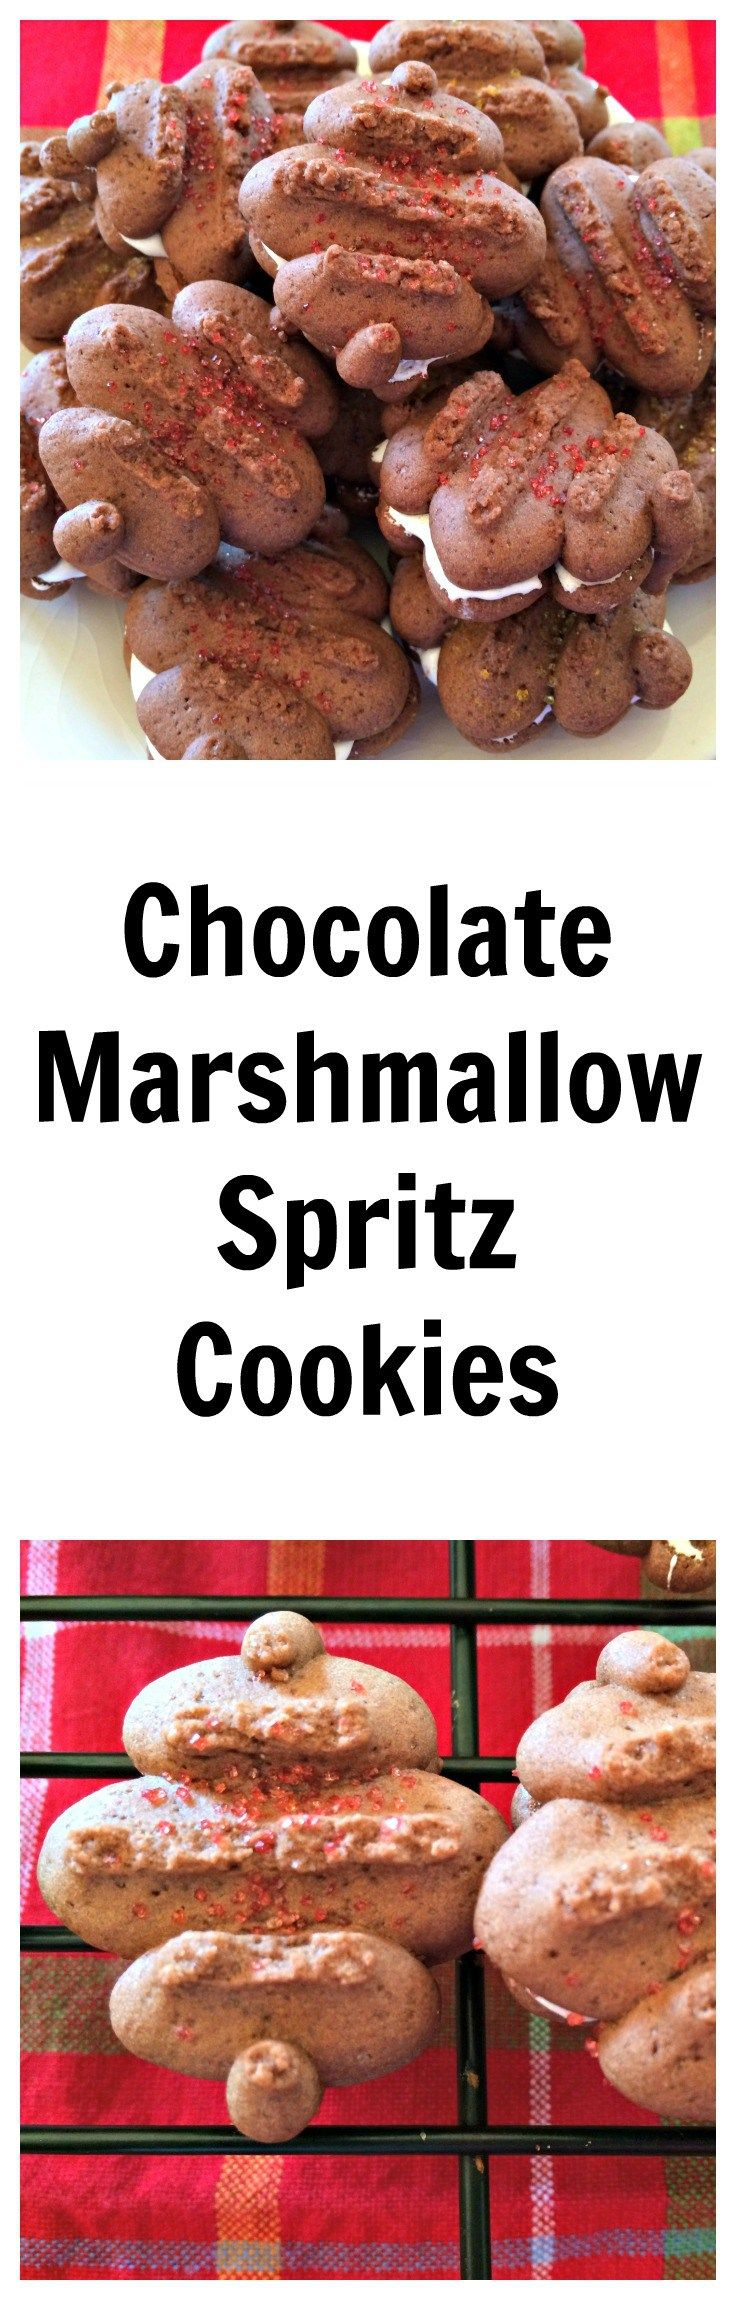 Chocolate Marshmallow Spritz Cookies